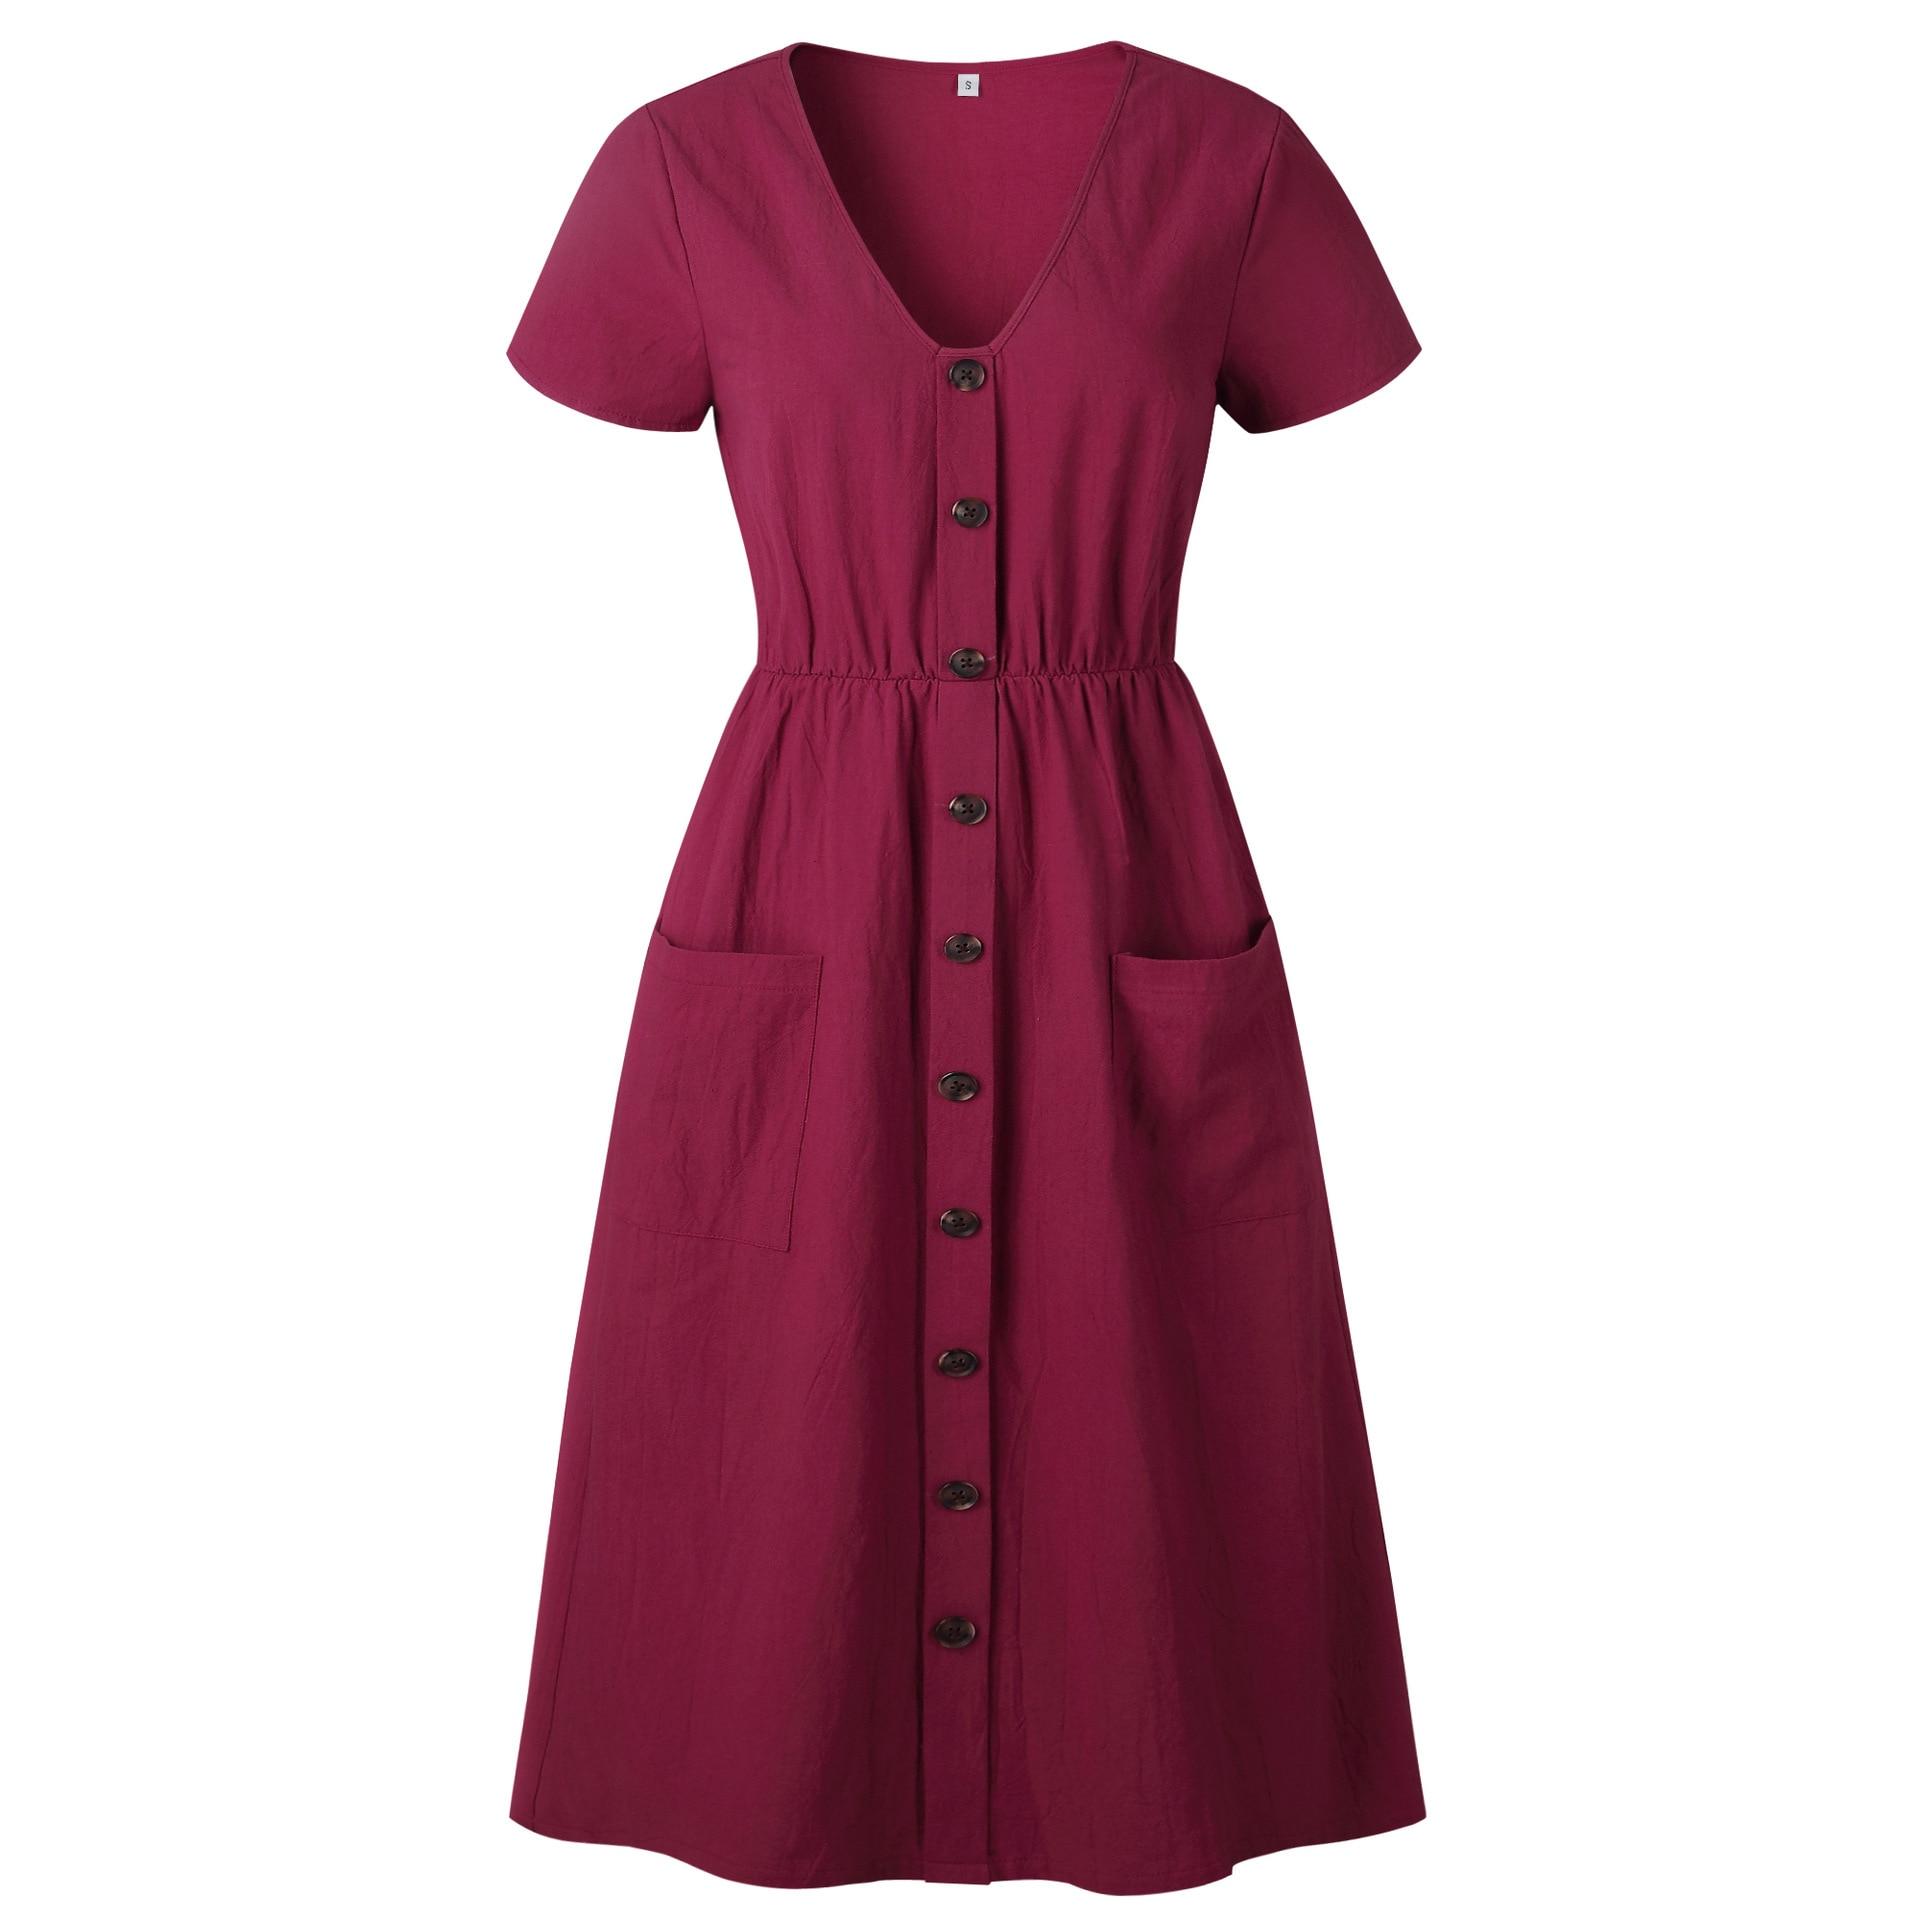 Red Blue A Line Casual Dresses Women Autumn Dress 19 Vintage Long Sleeve Dress For Ladies Buttons V Neck Midi Vestidos Female 91